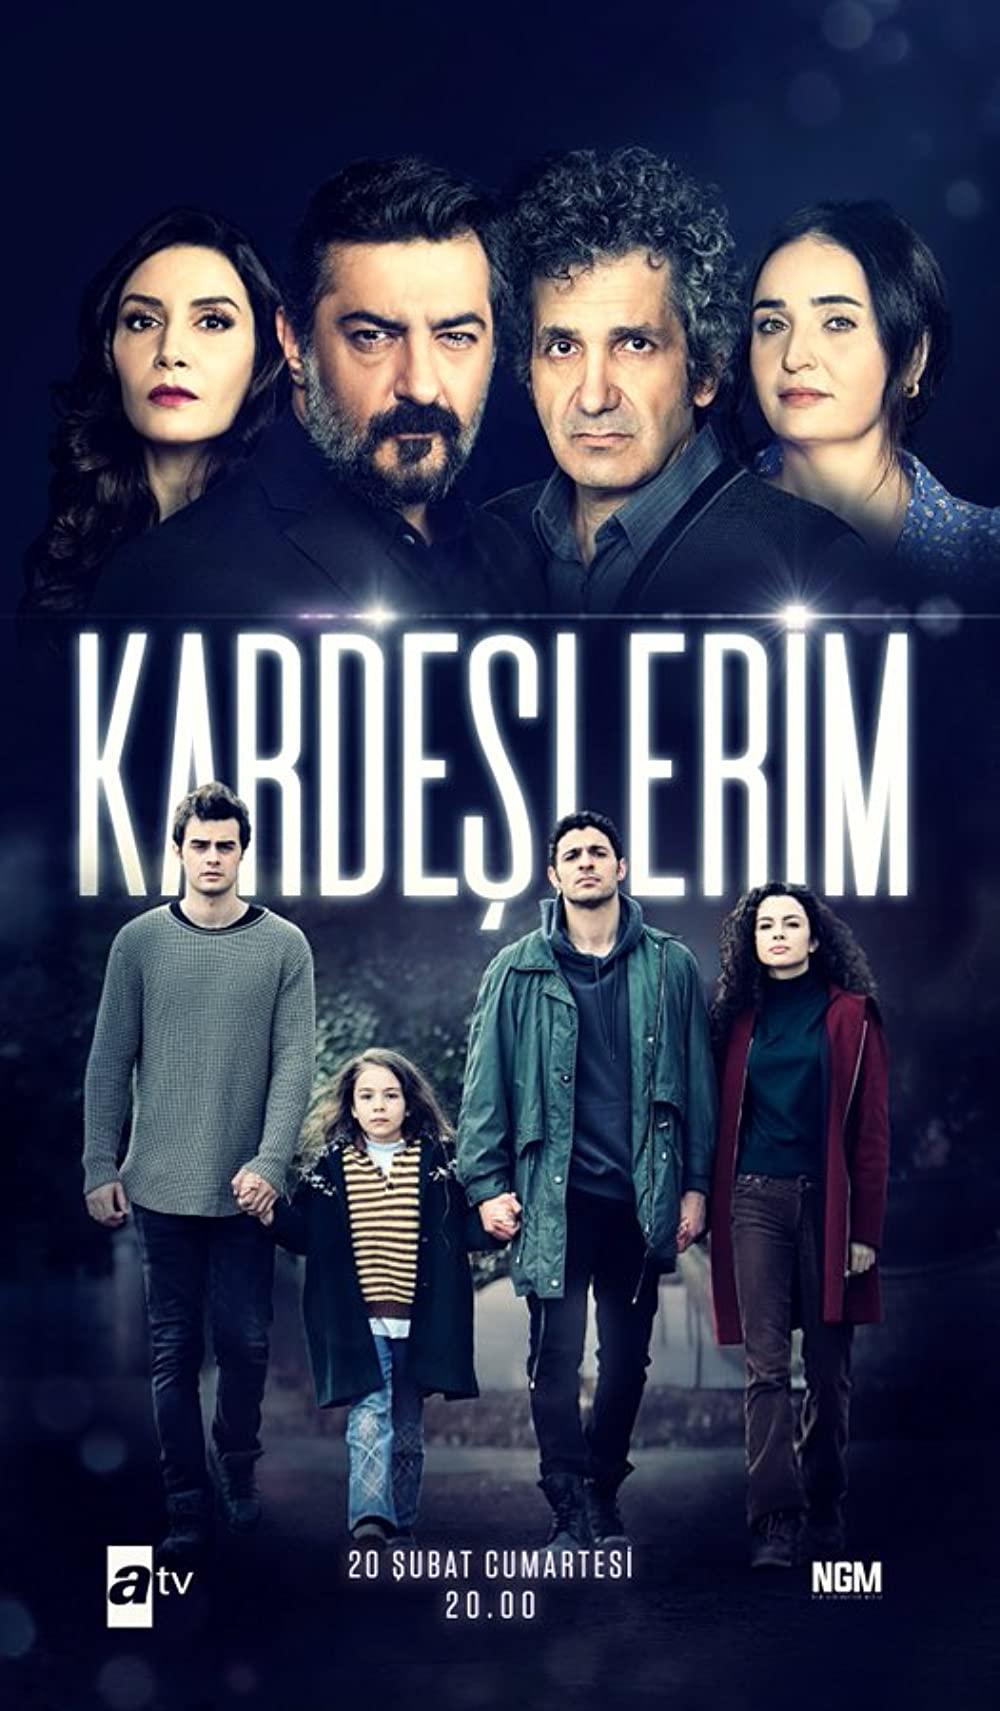 Kardeslerim episode 23 English Subtitles| My Brothers